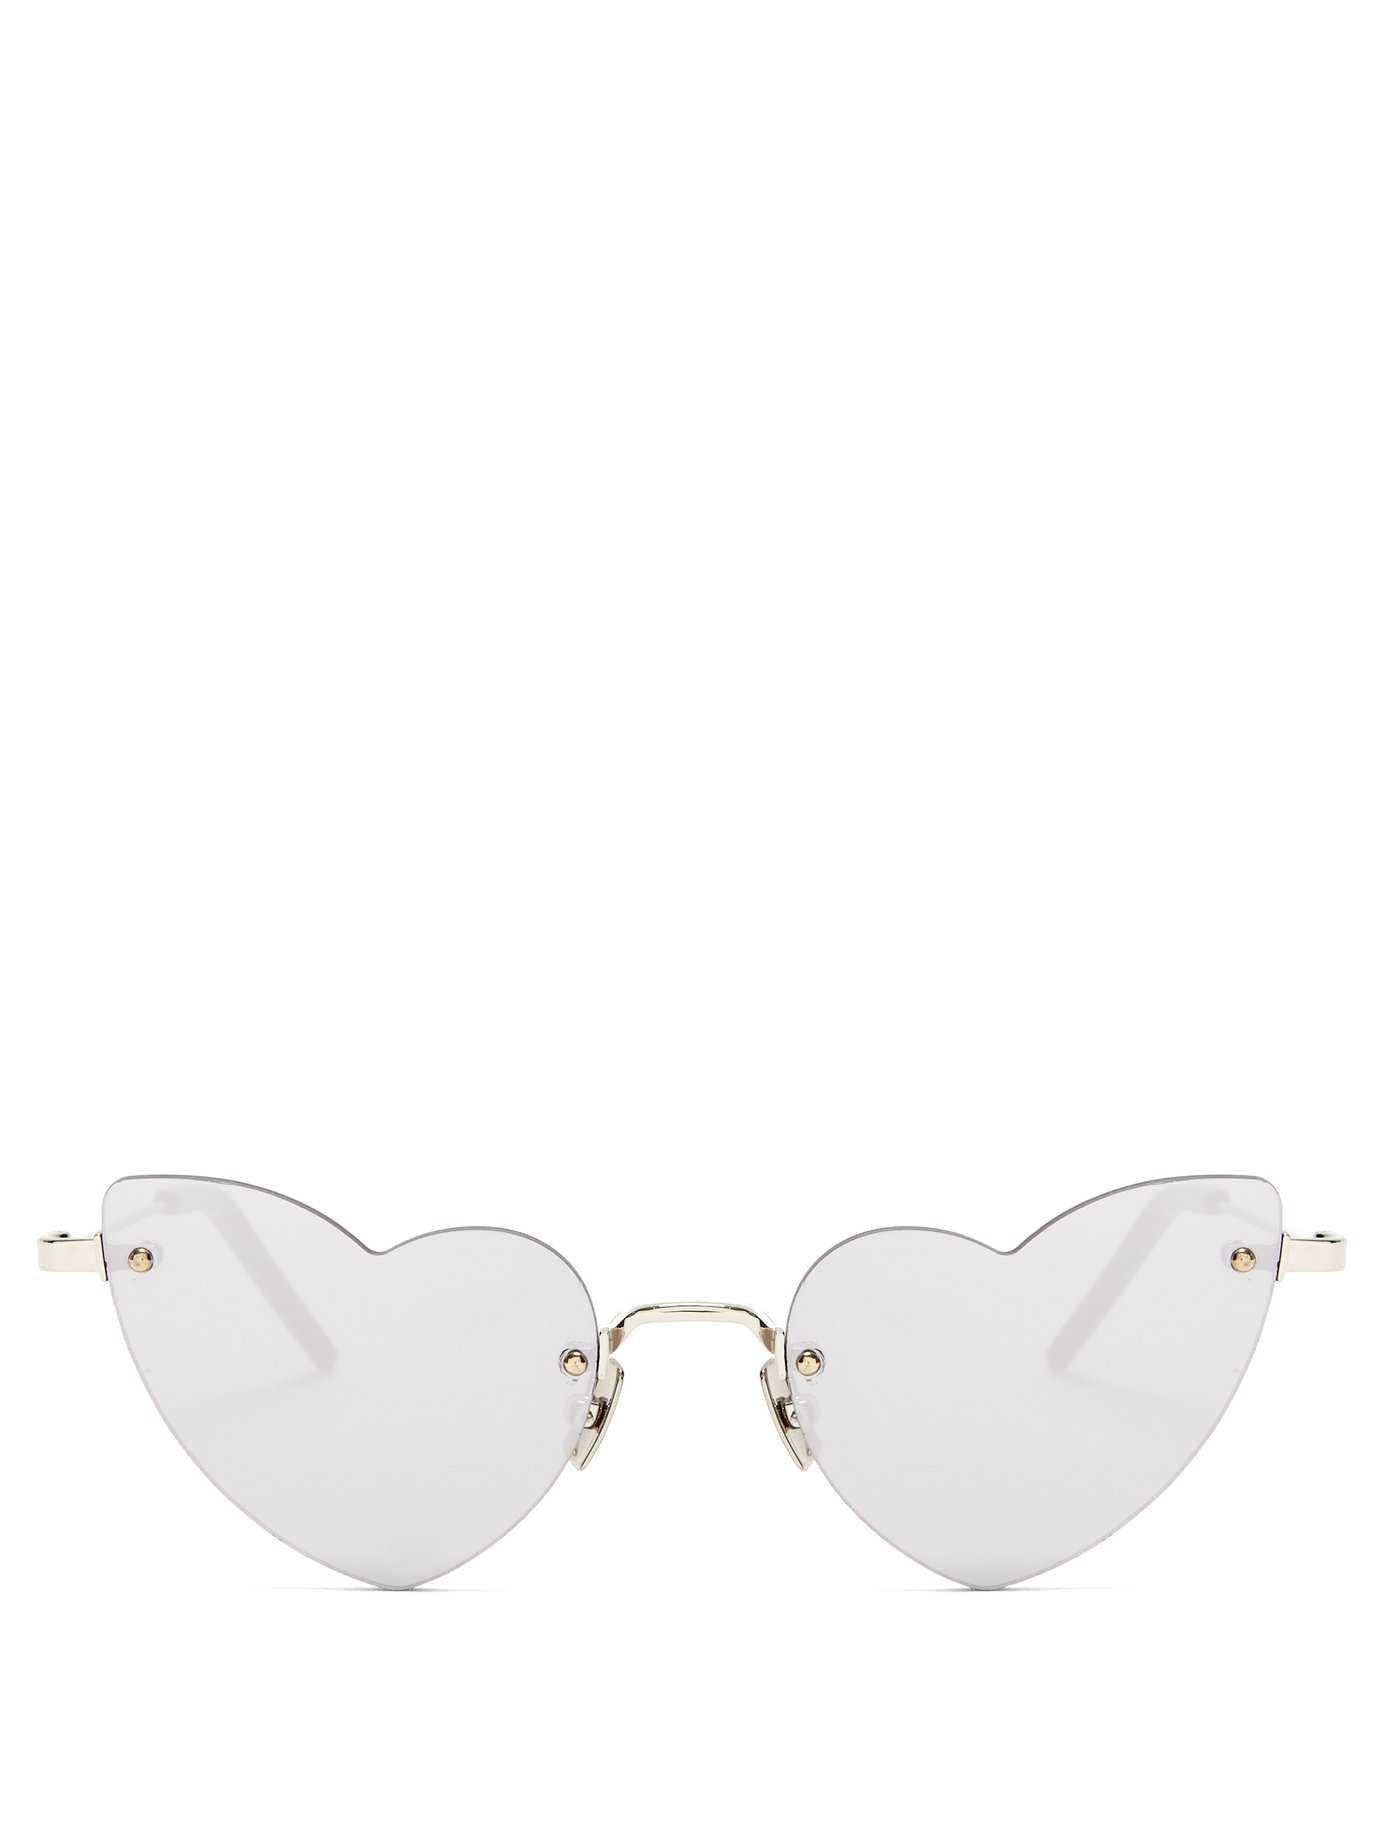 Loulou heart-shaped metal sunglasses | Saint Laurent | MATCHESFASHION.COM US